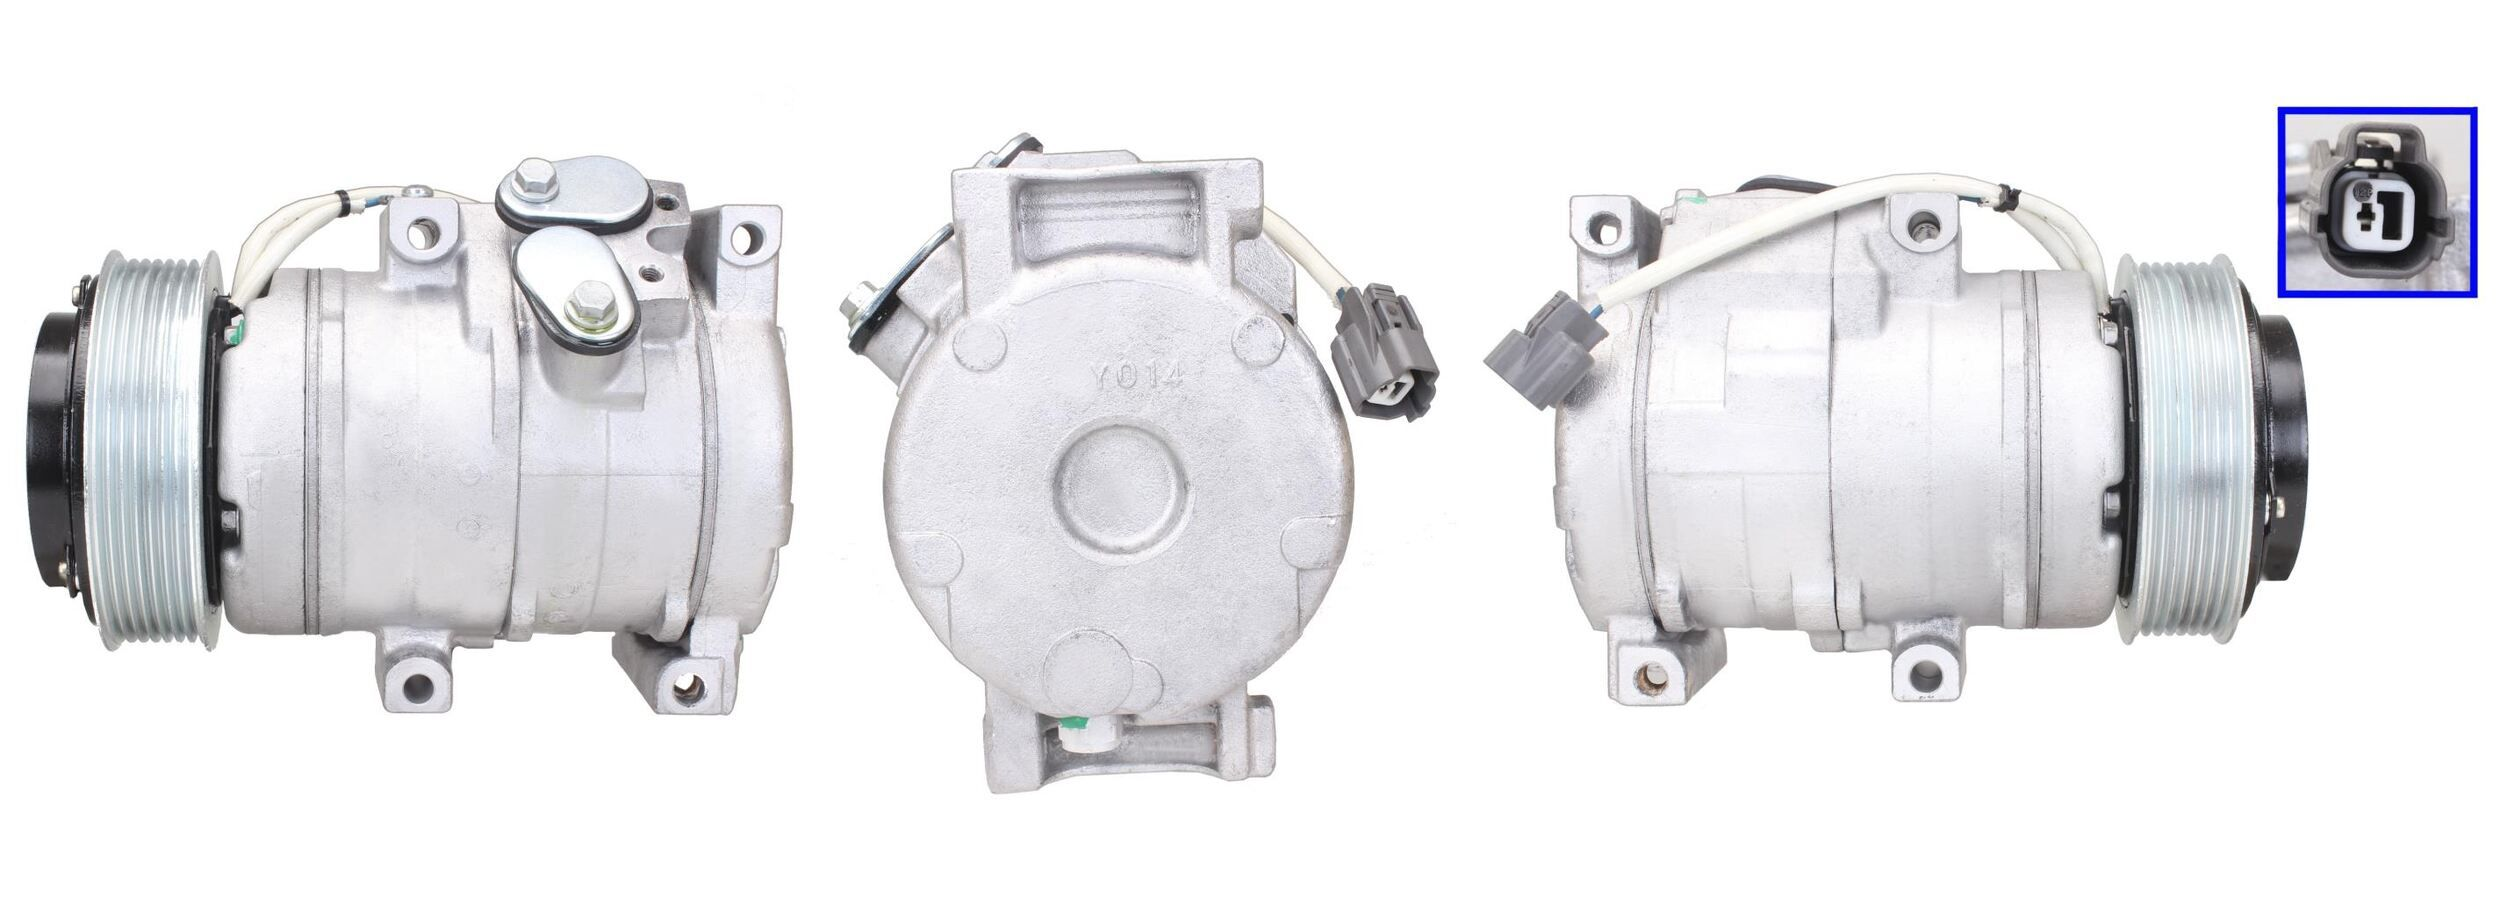 Original HONDA Kompressor Klimaanlage 51-0569